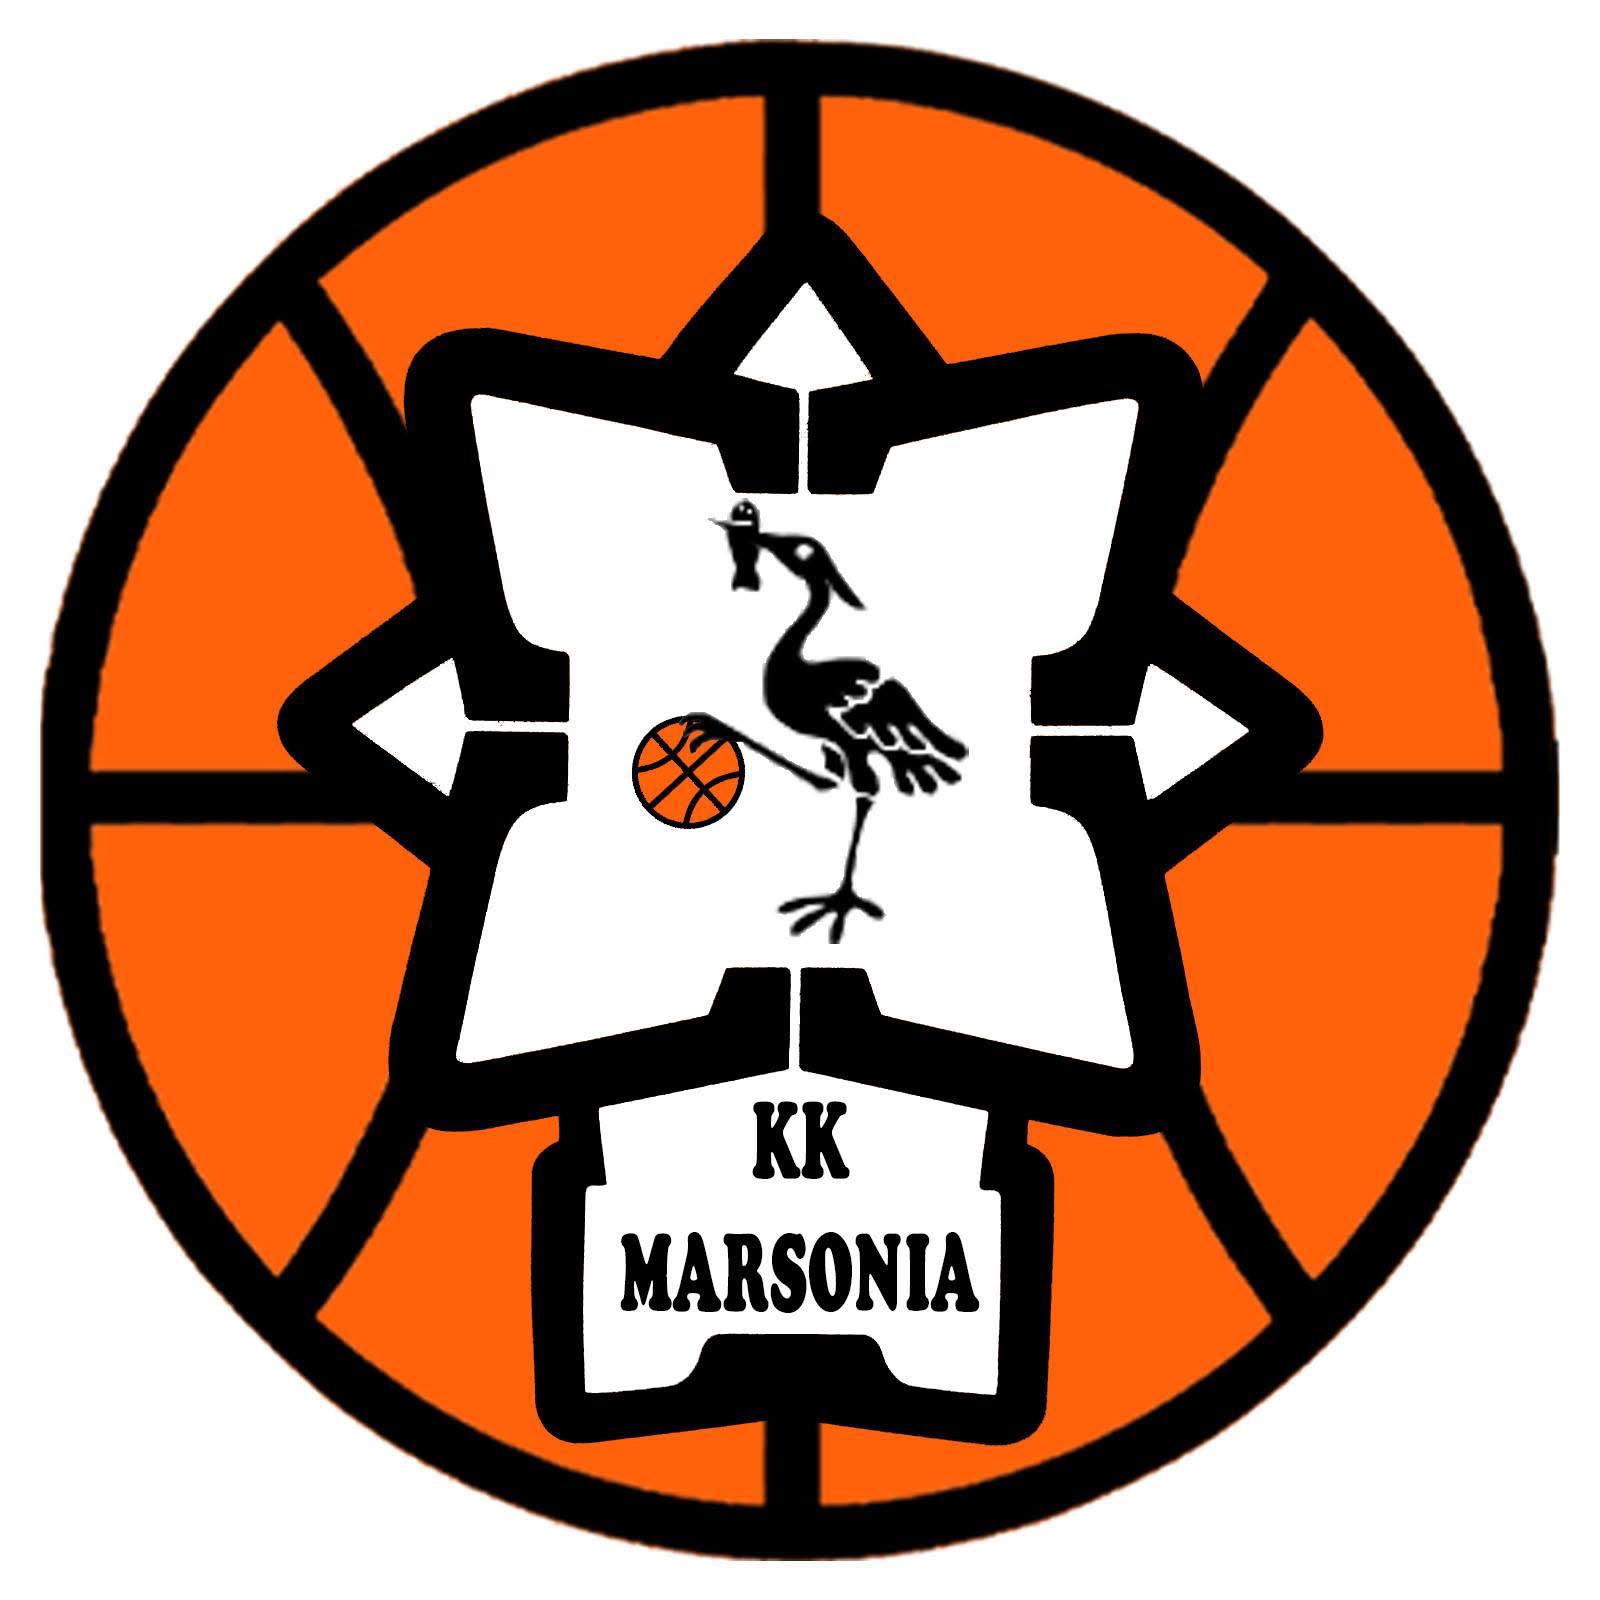 KK Marsonia